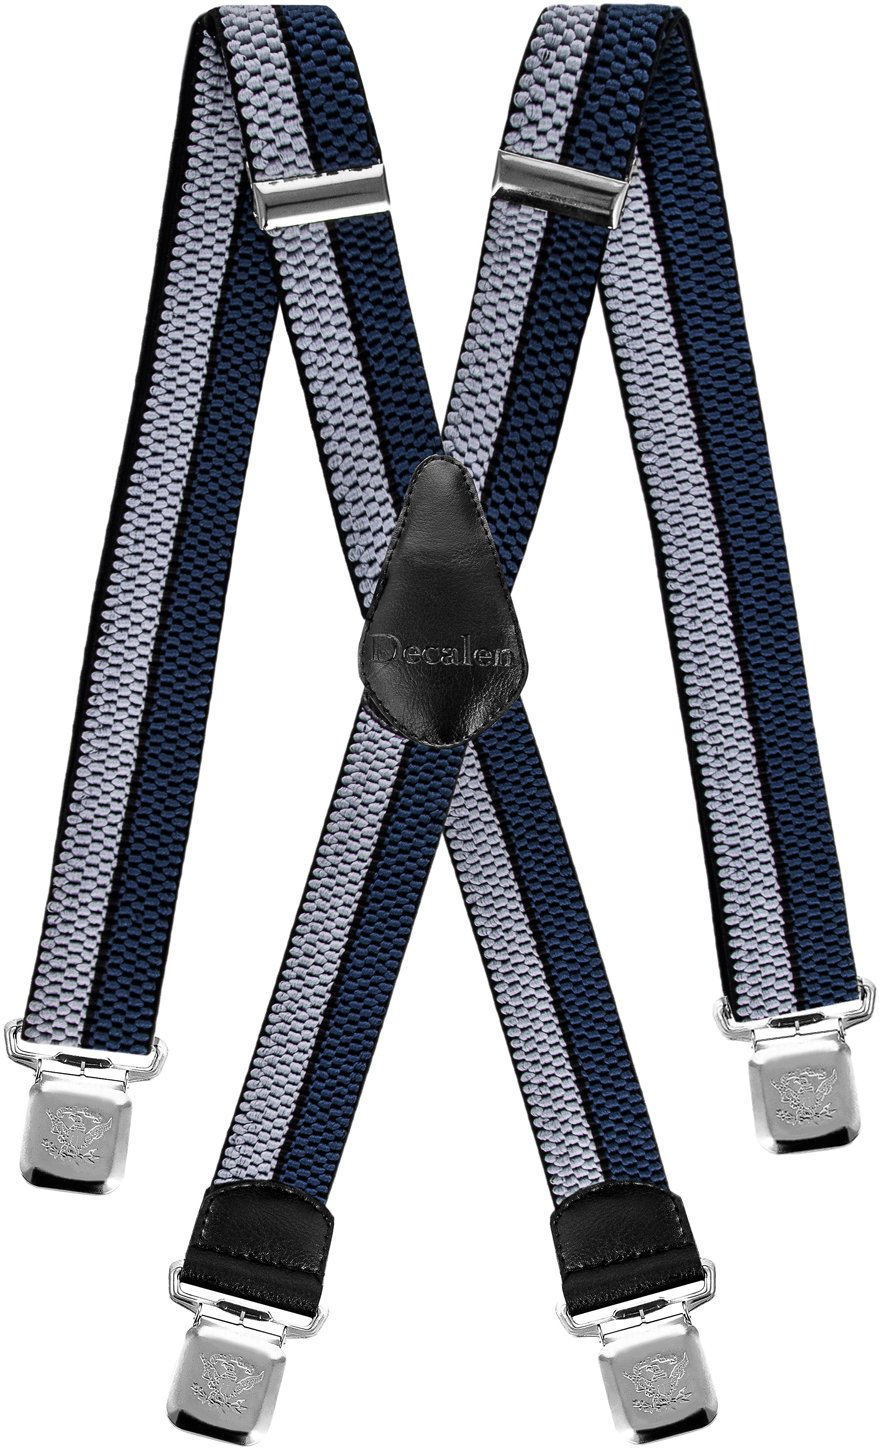 Msendro ACCESSORY メンズ B079QKJW3T Silver Black Blue Silver Black Blue